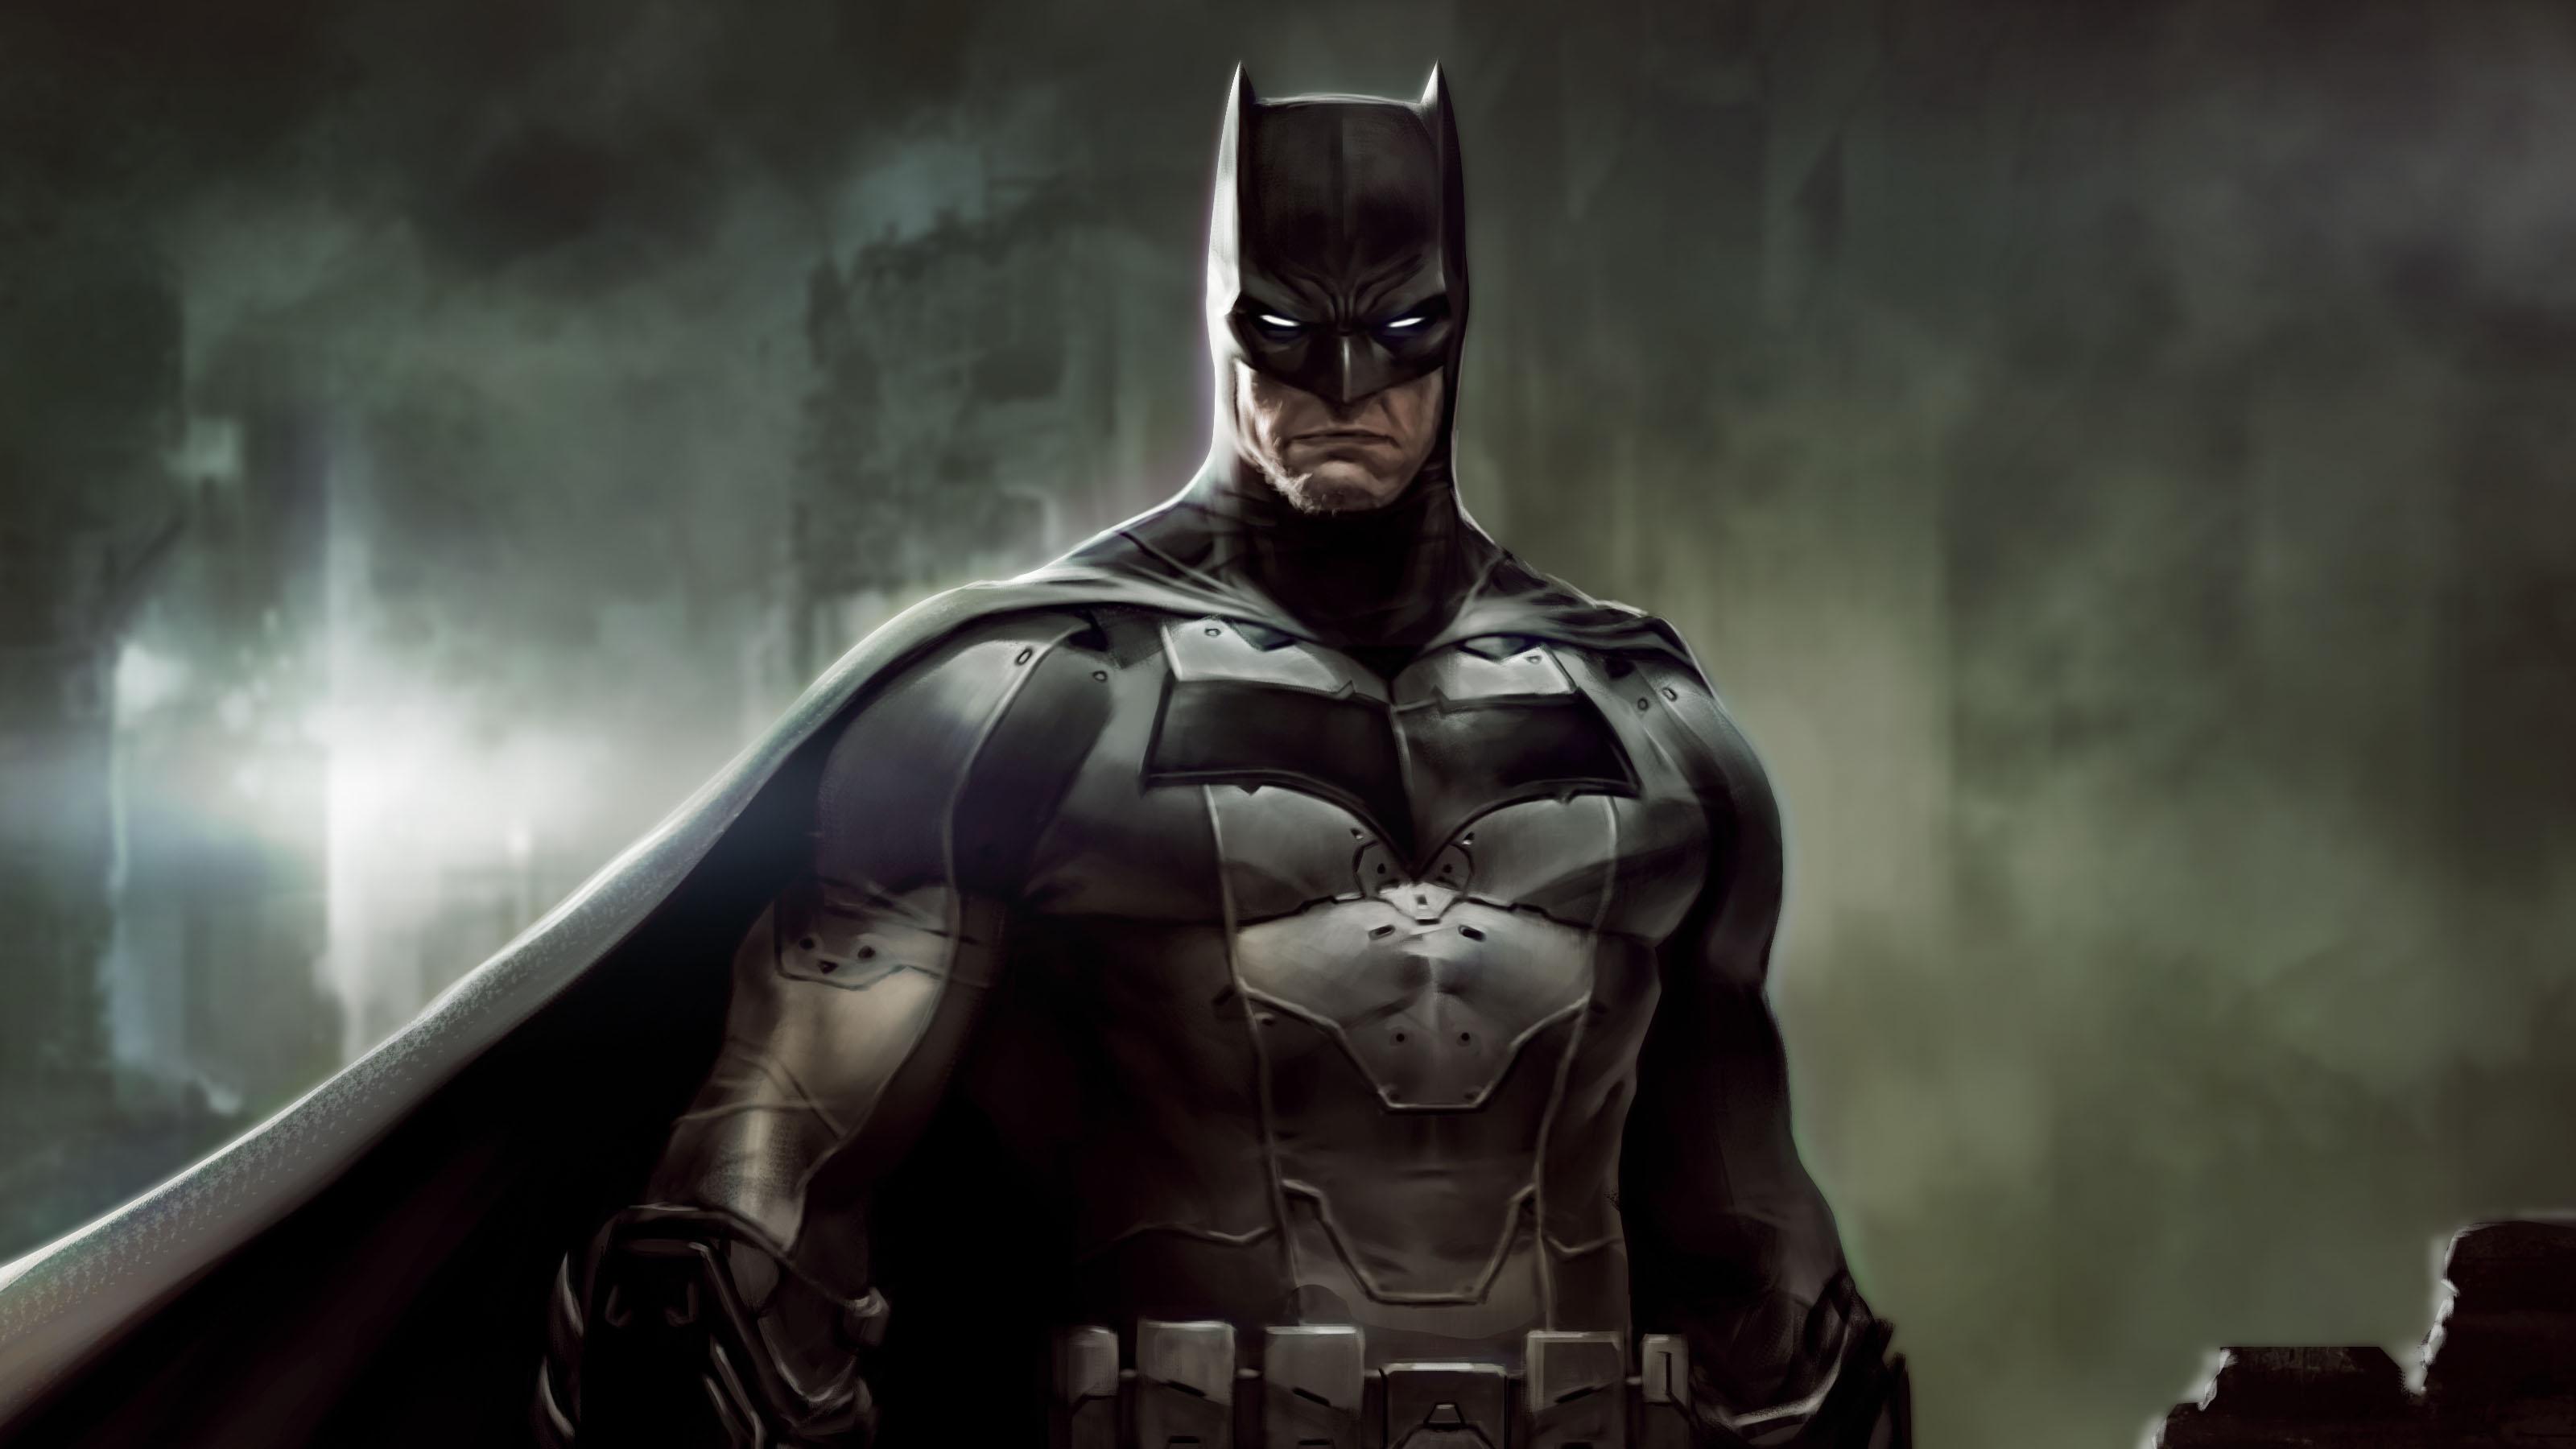 The Dark Knight Gotham Doom Hd Superheroes 4k Wallpapers Images